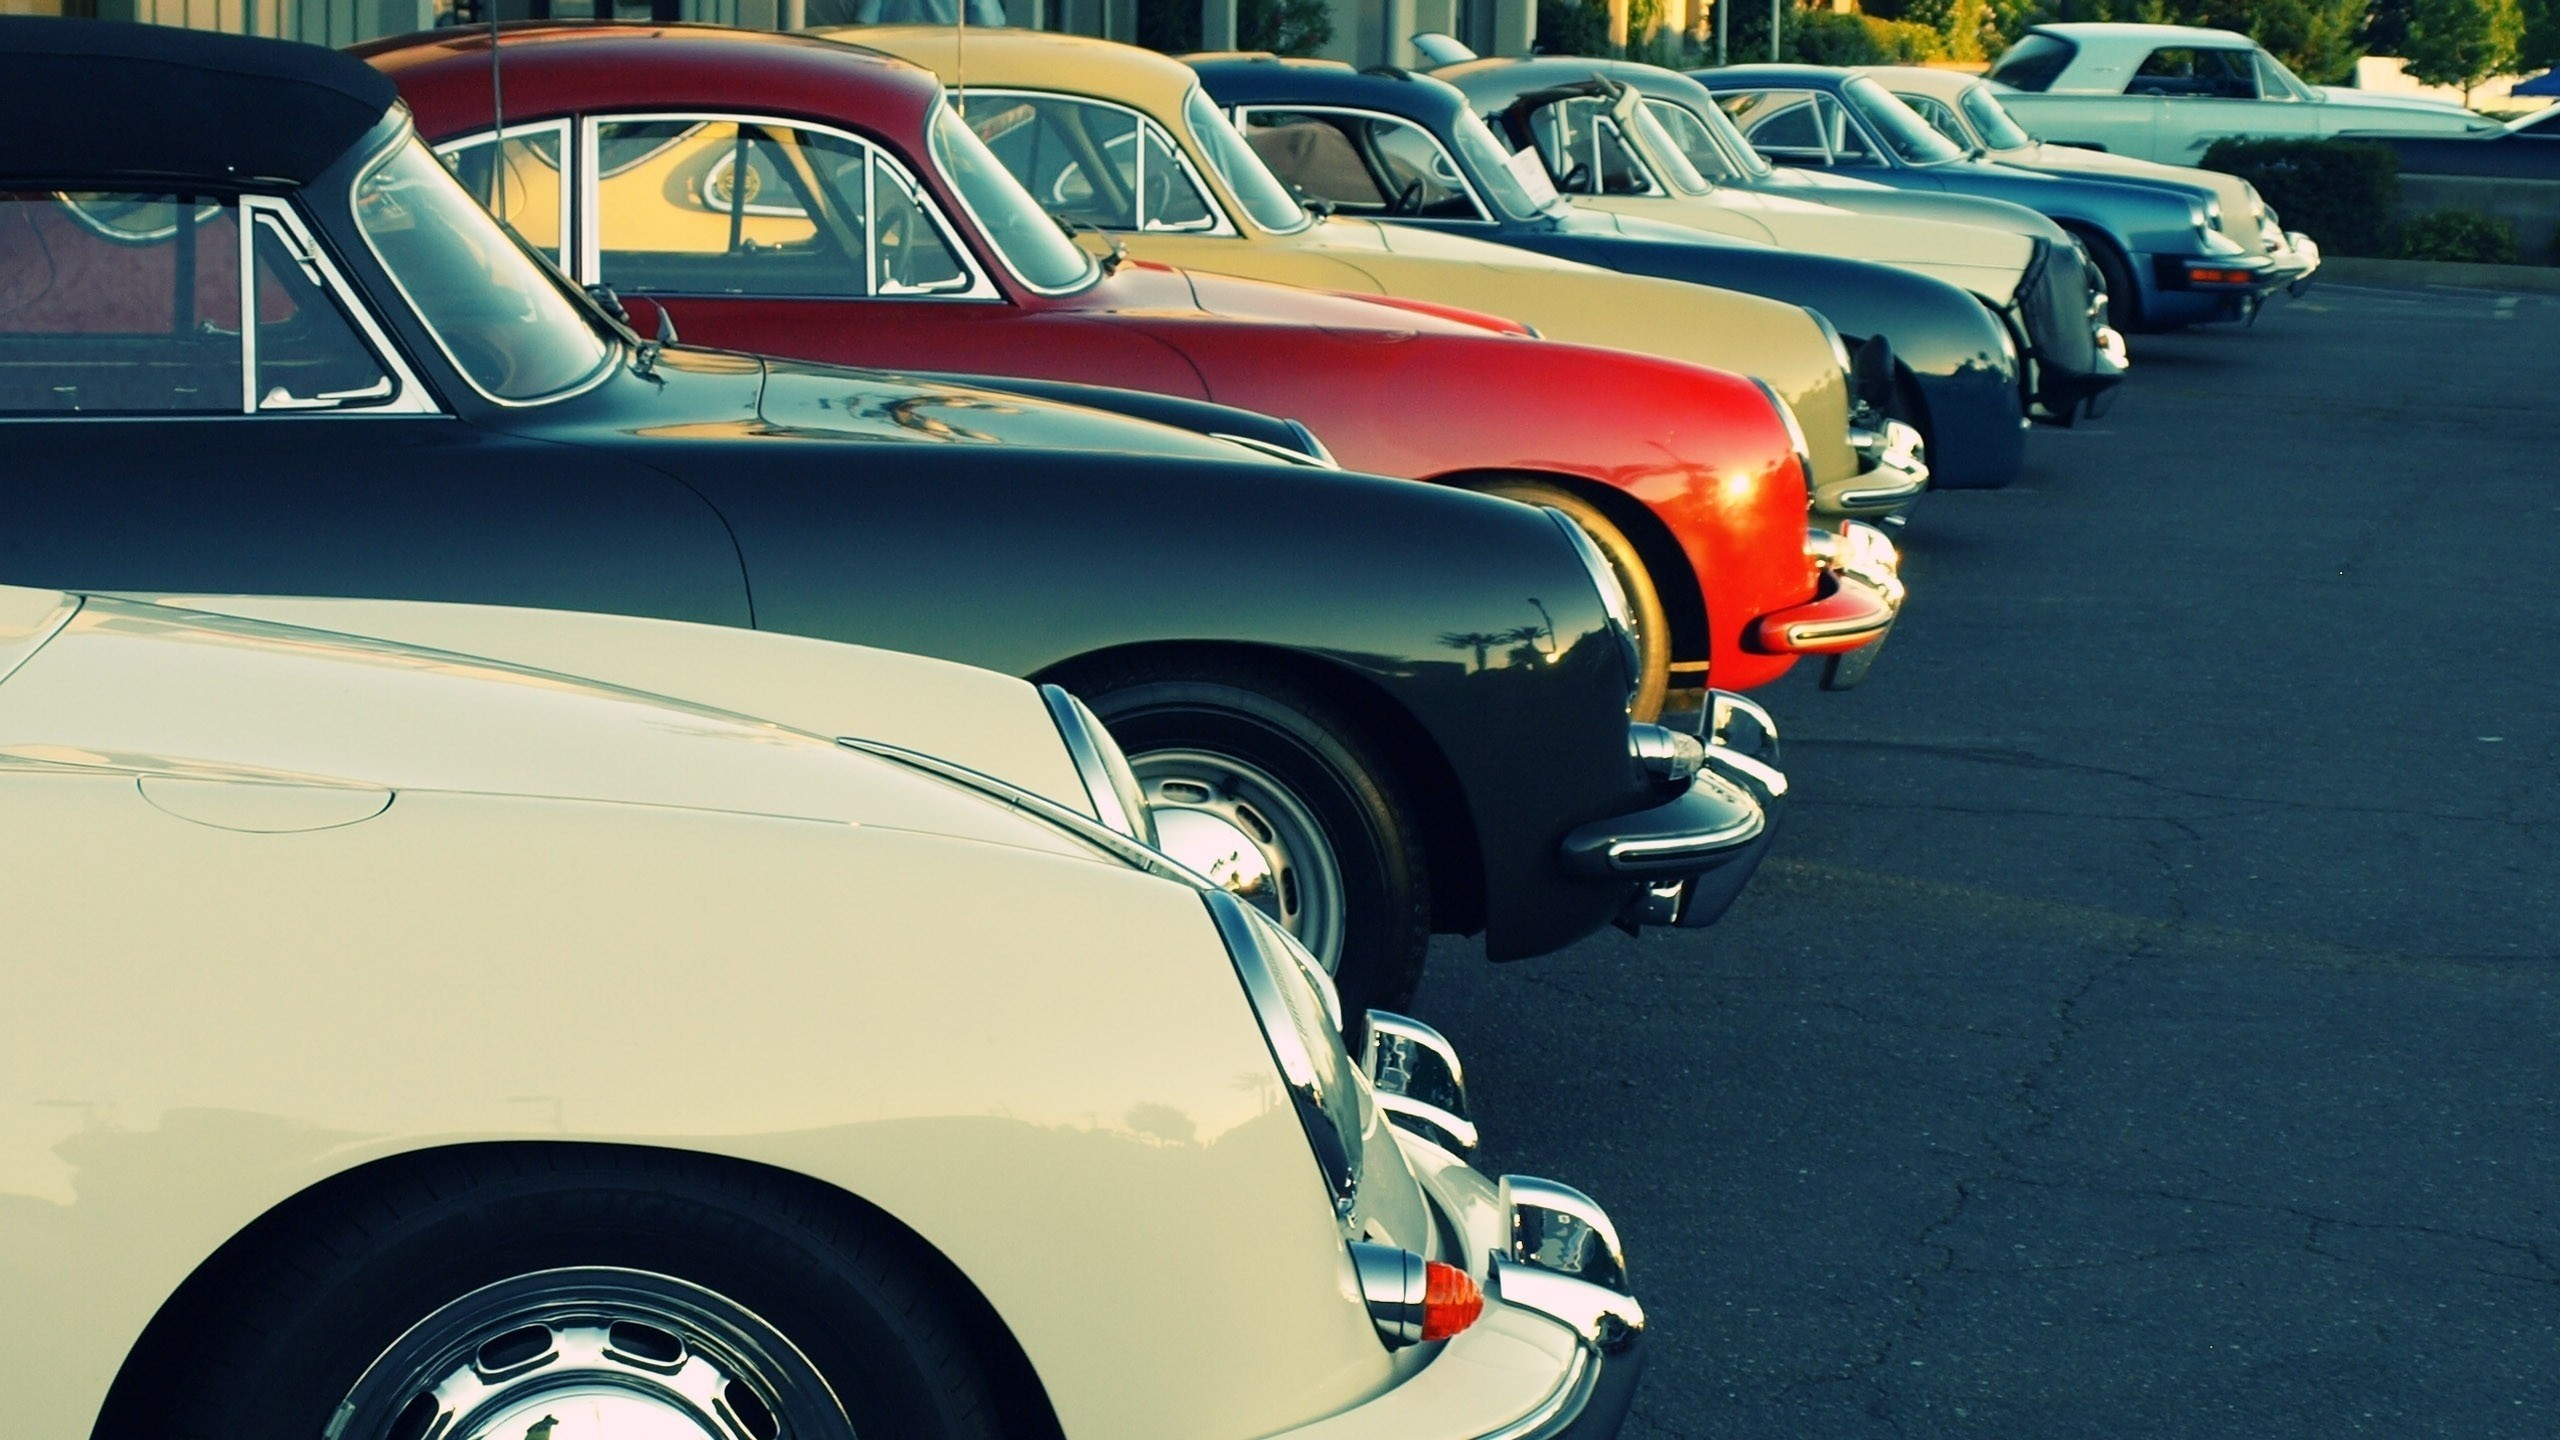 Vintage Car Wallpaper 1